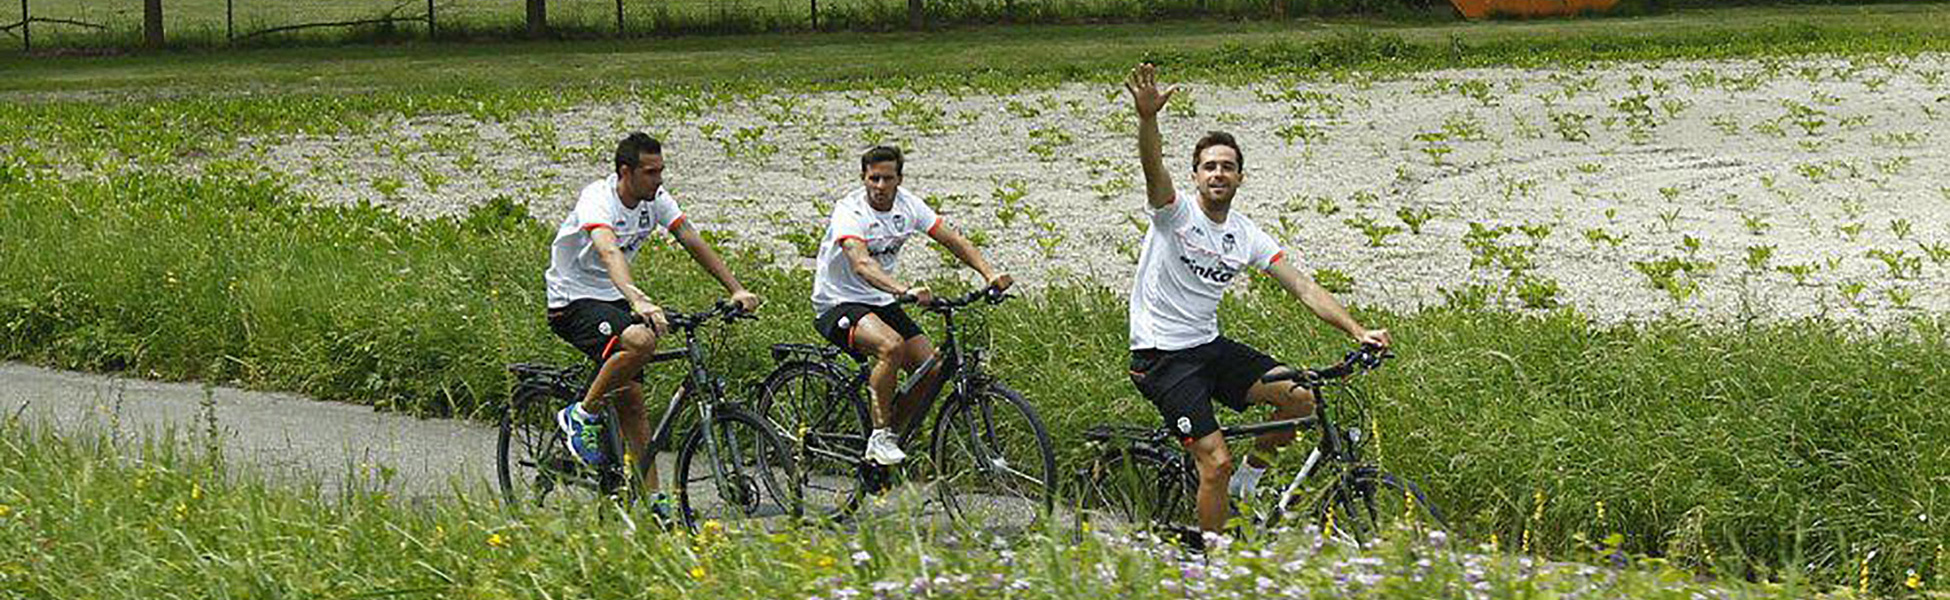 Radtour mit dem FC Valencia